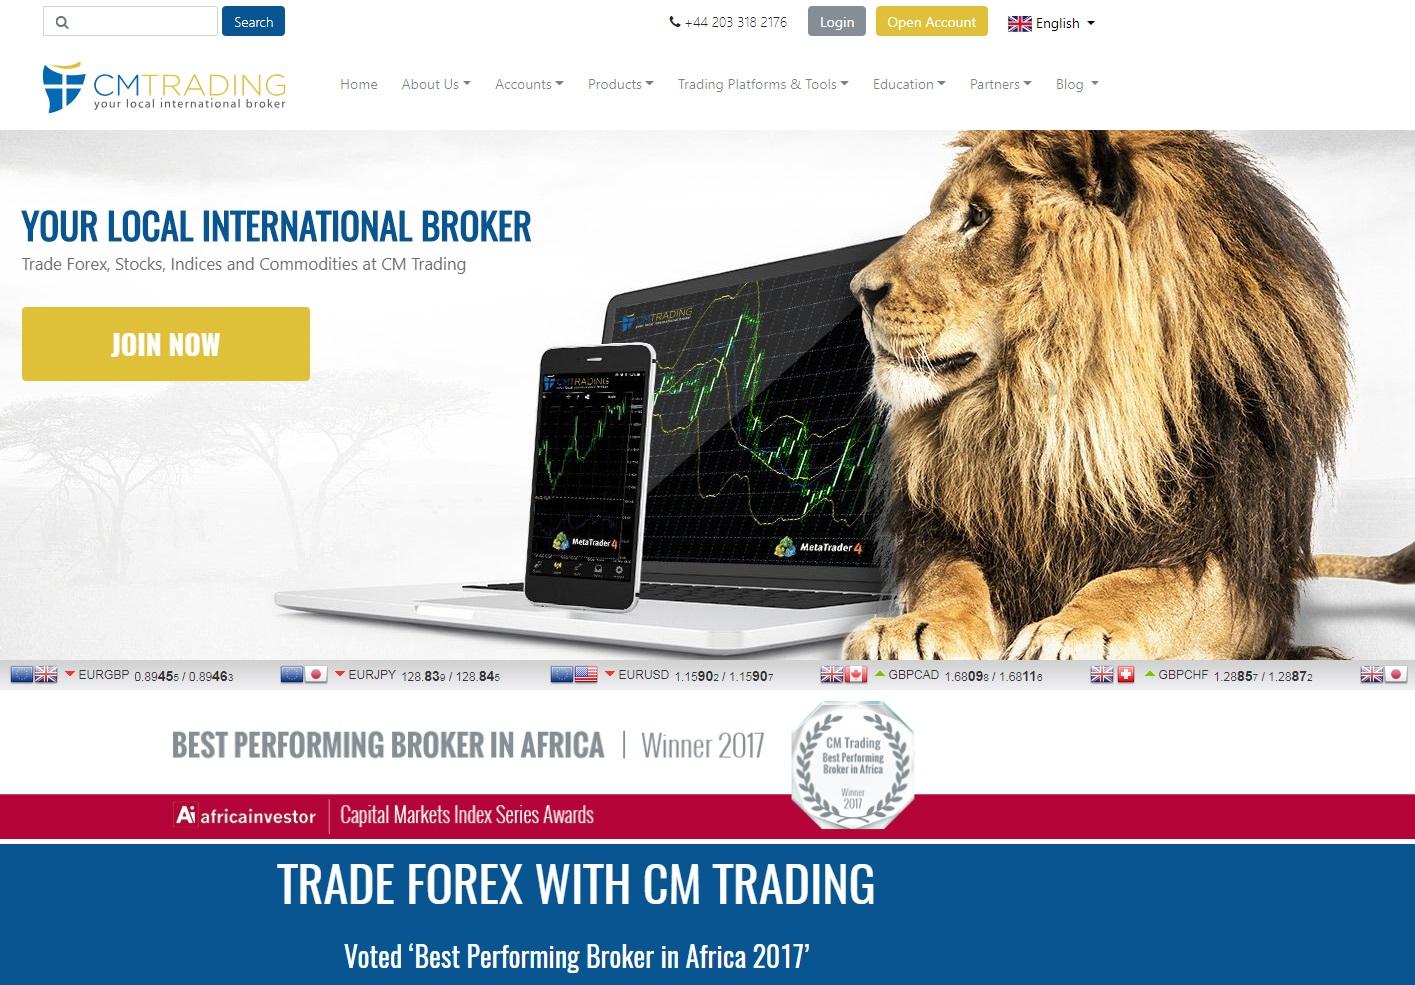 CM Trading - Award Winning Broker Can Fulfill All Your Trading Needs